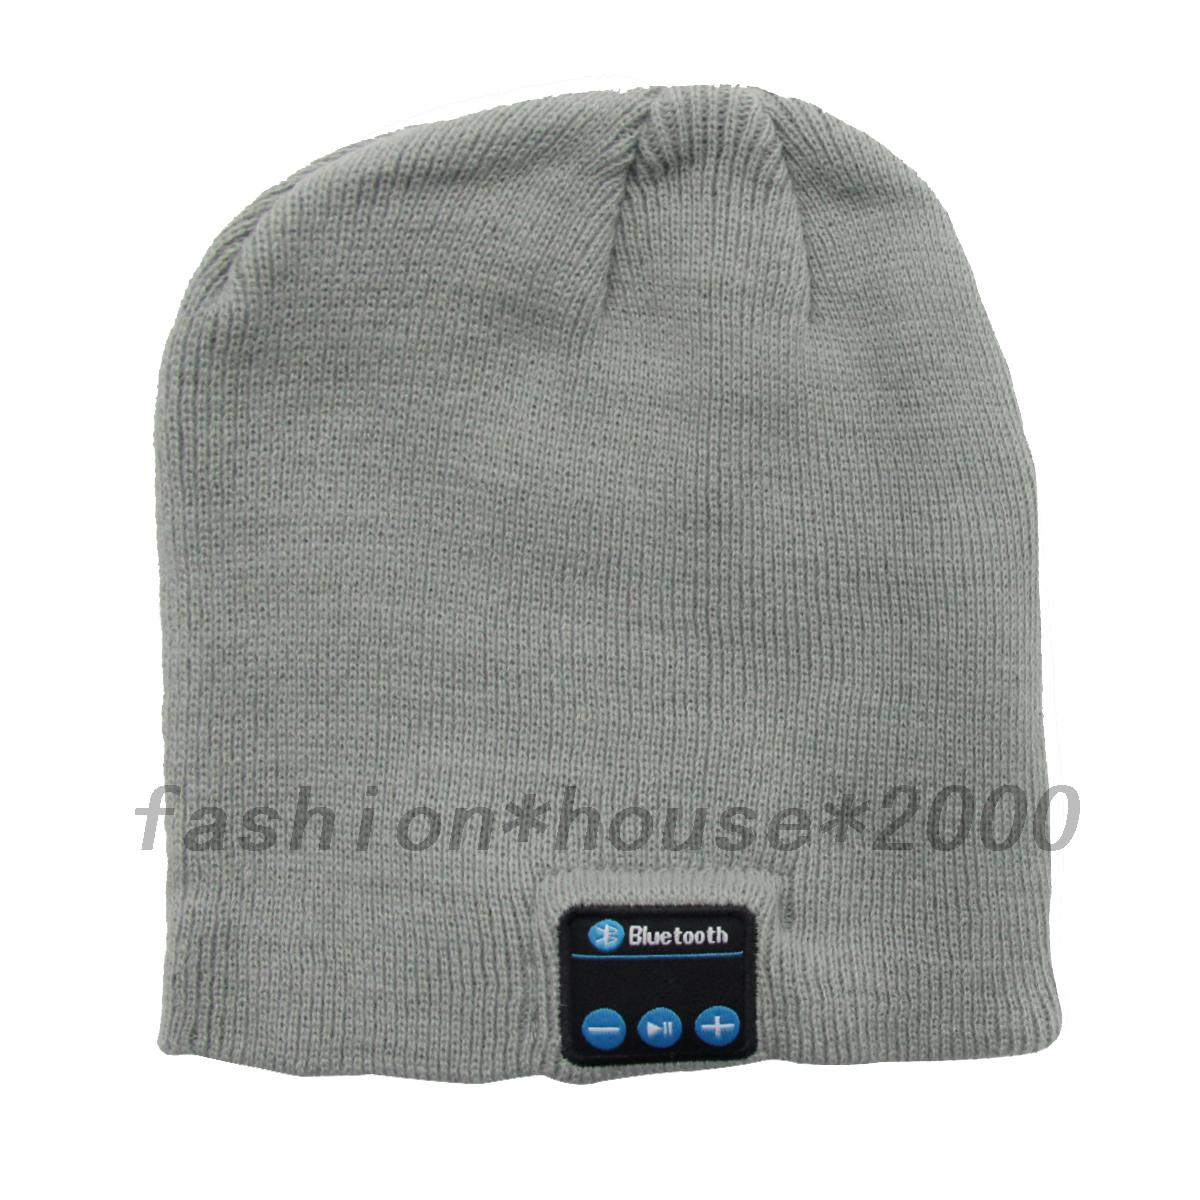 Wireless-Bluetooth-Audio-Speaker-Headset-Hat-Headphone-Earphone-Cap-Player-Music